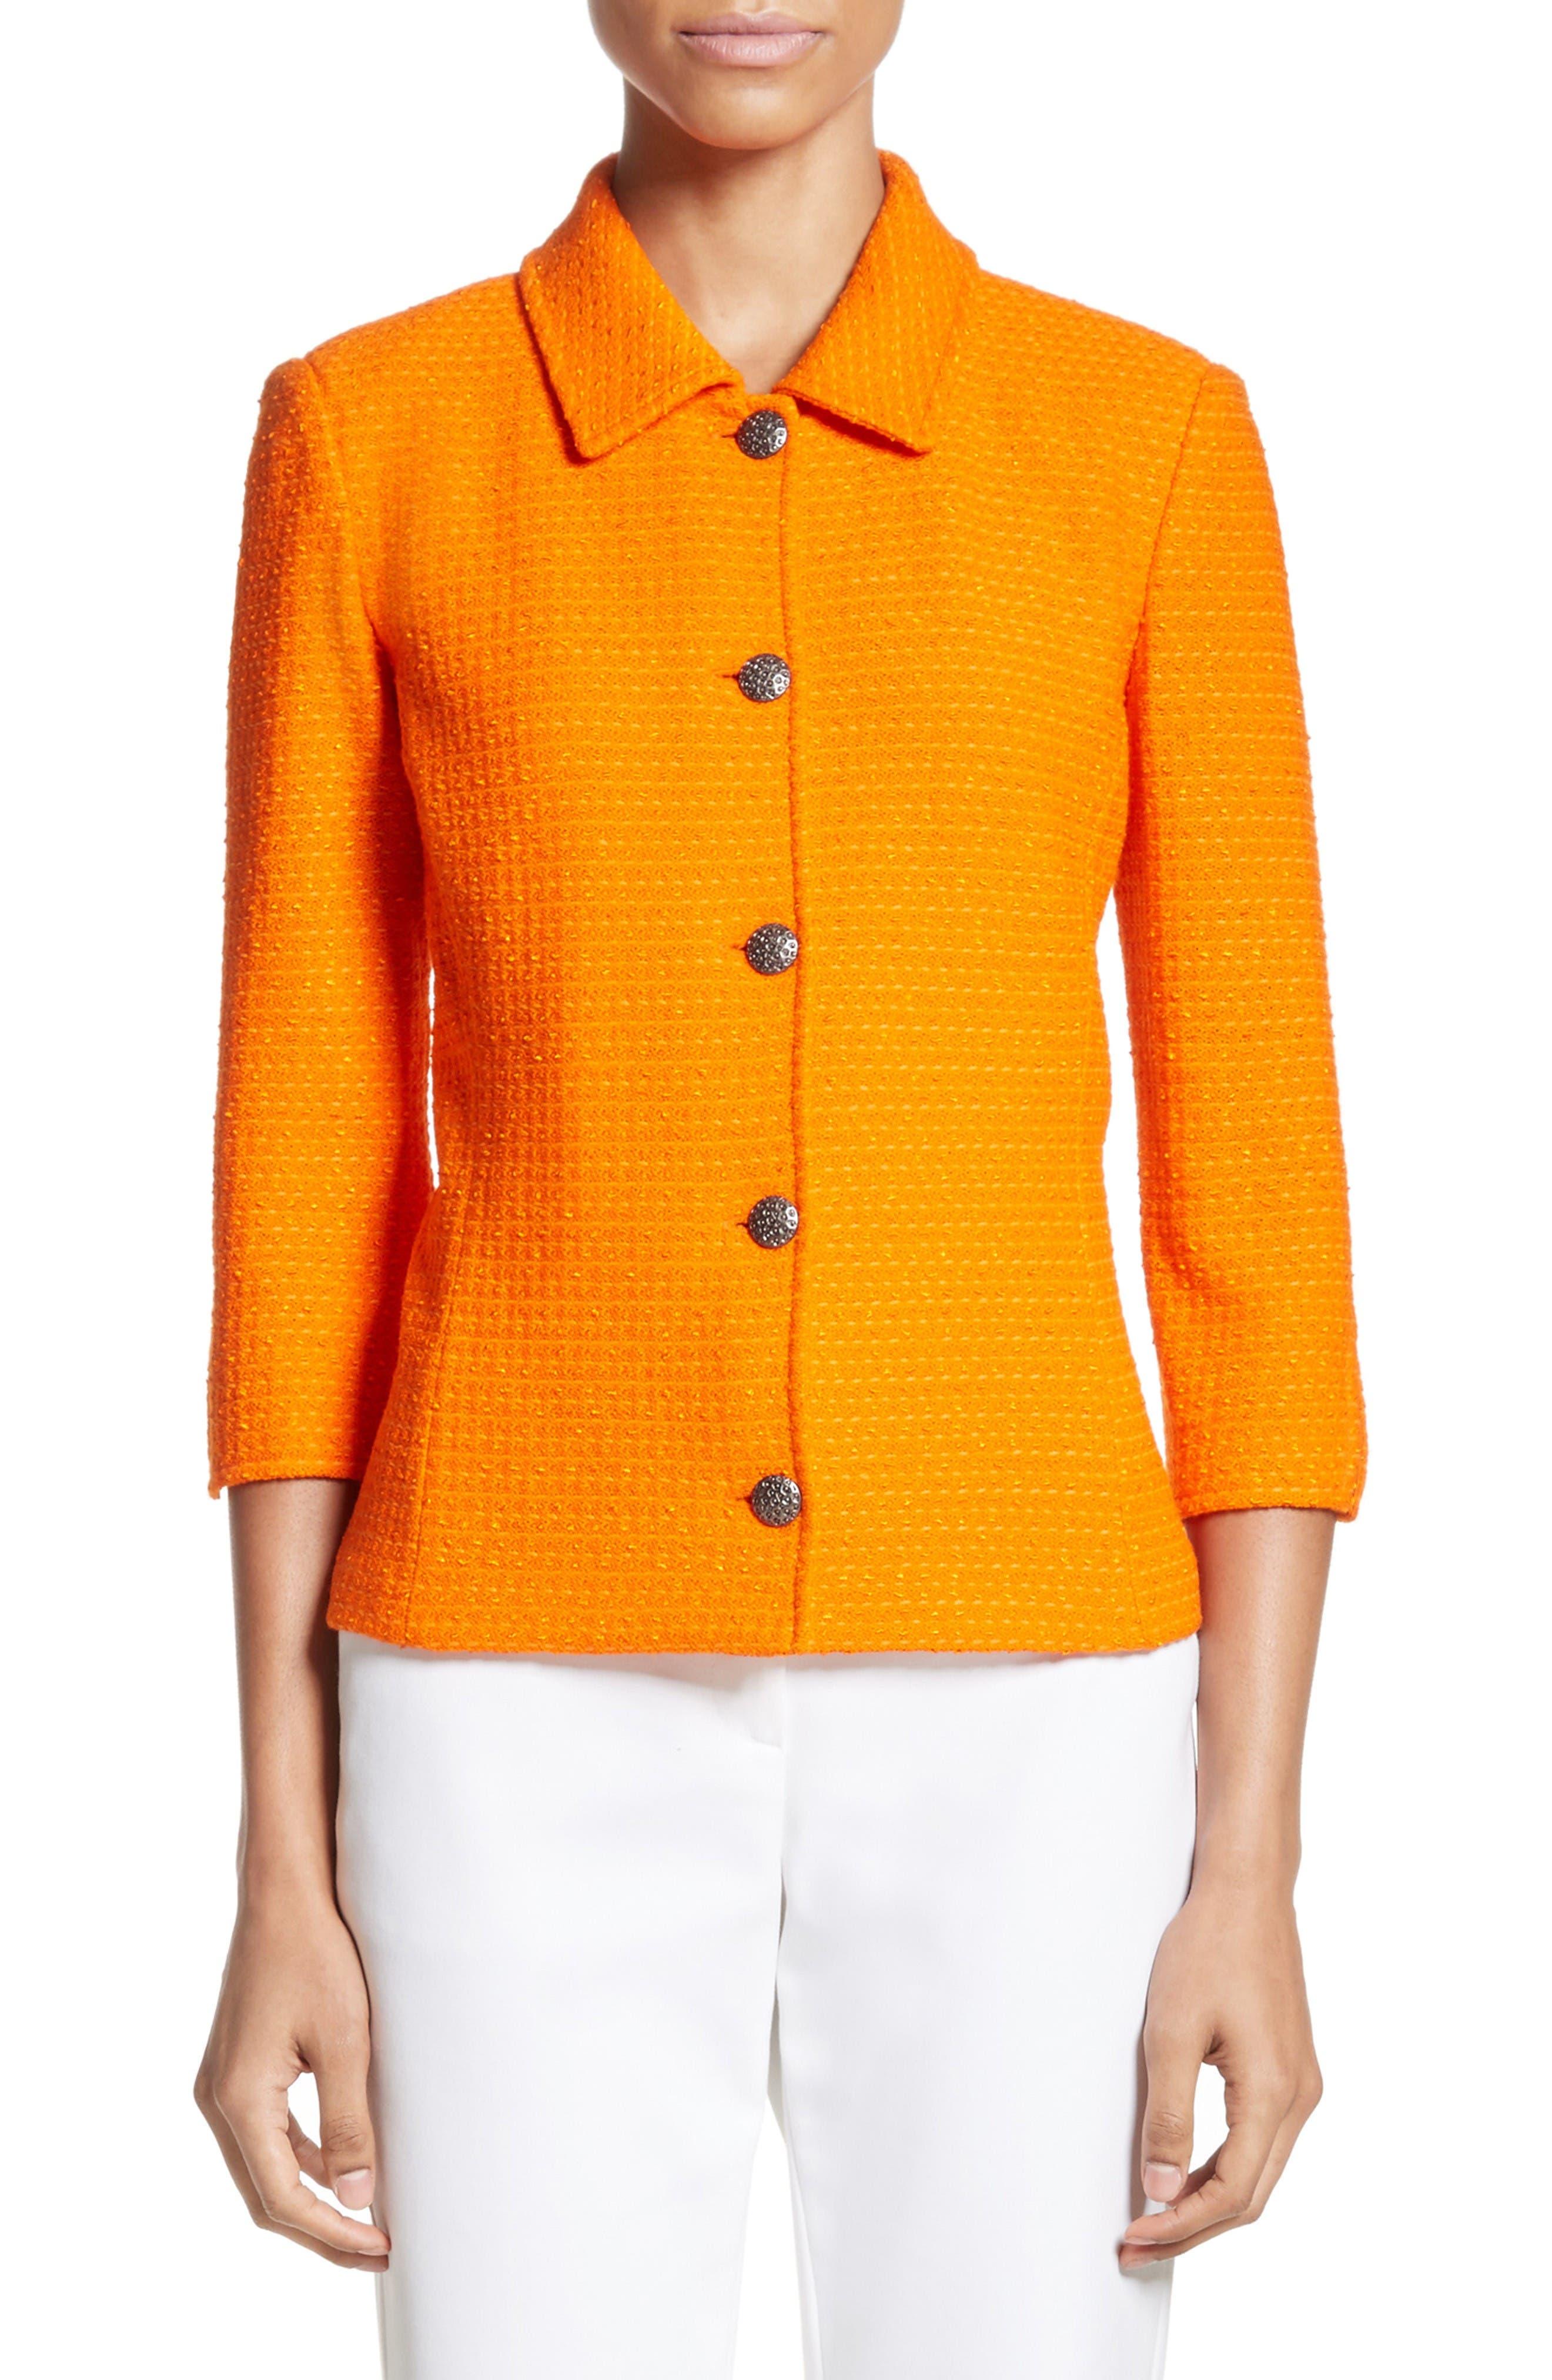 Main Image - St. John Collection Ribbon Texture Knit Jacket